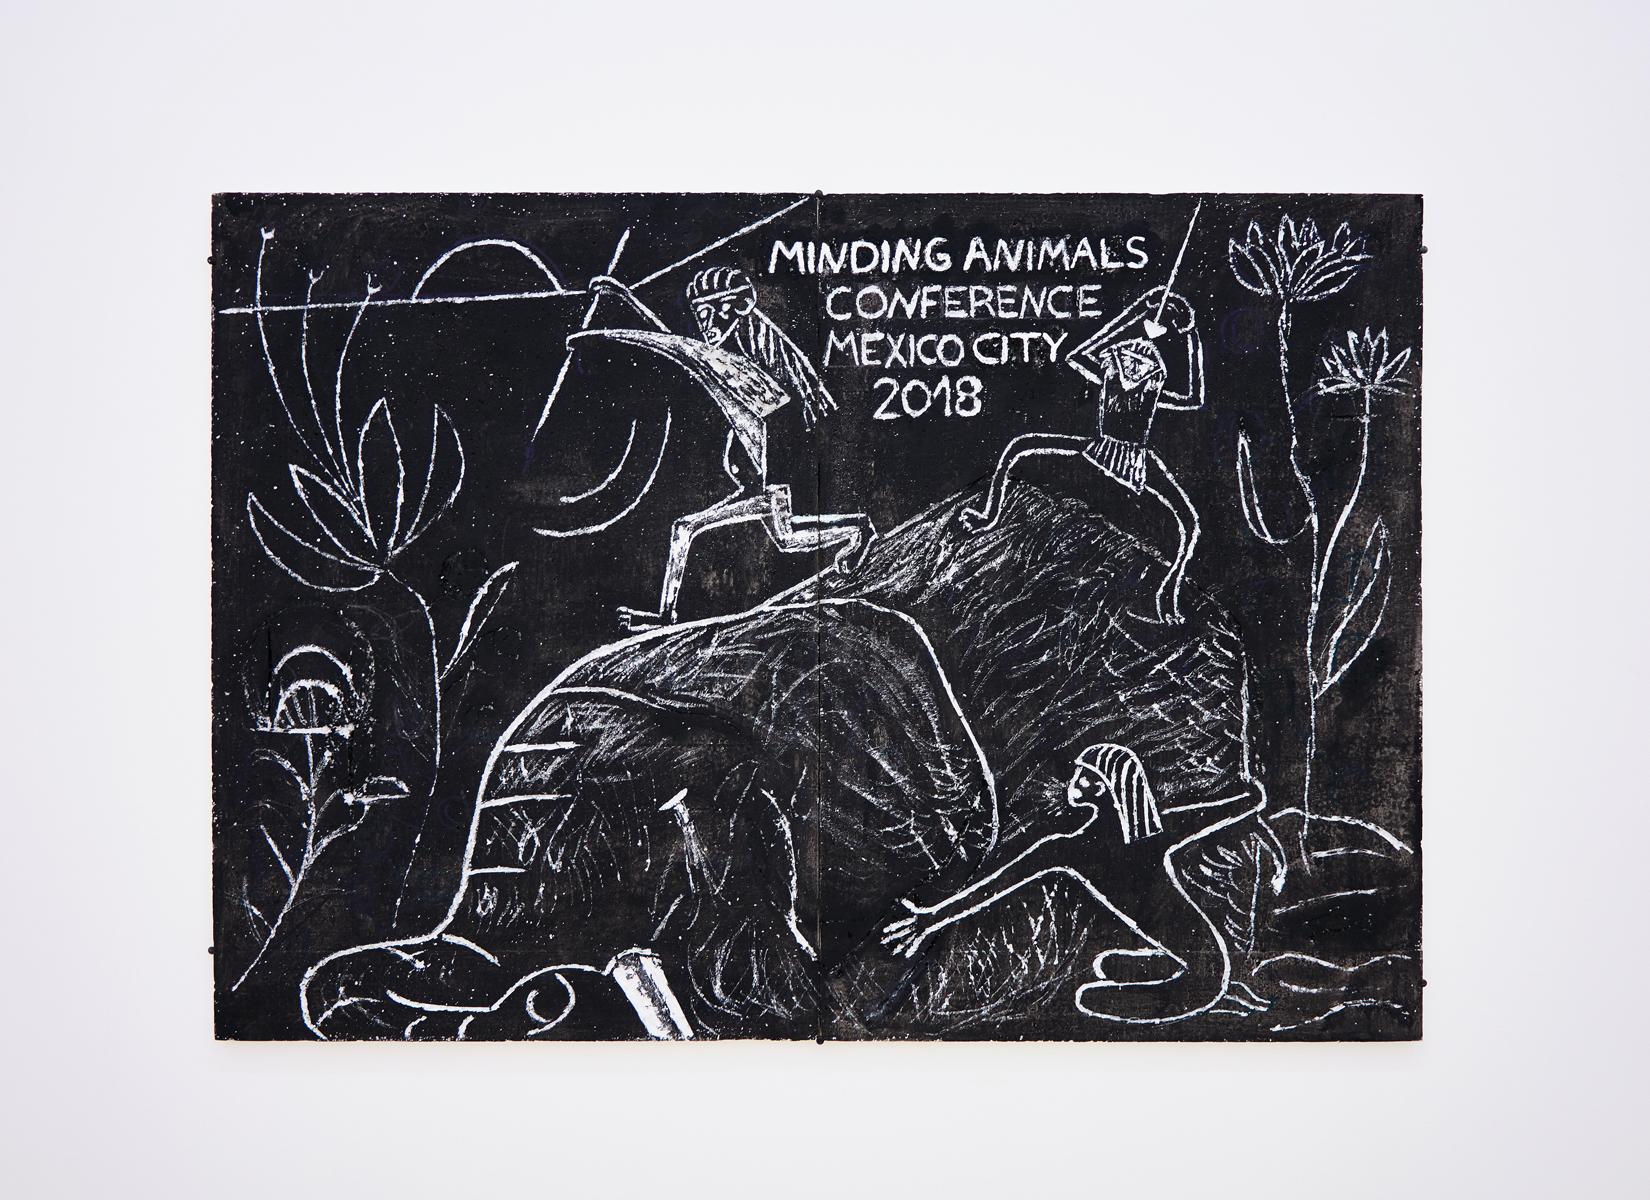 Lin May Saeed, Mammoth relief, 2017. Styrofoam, acrylic paint, cardboard, 56 x 80 x 5 cm